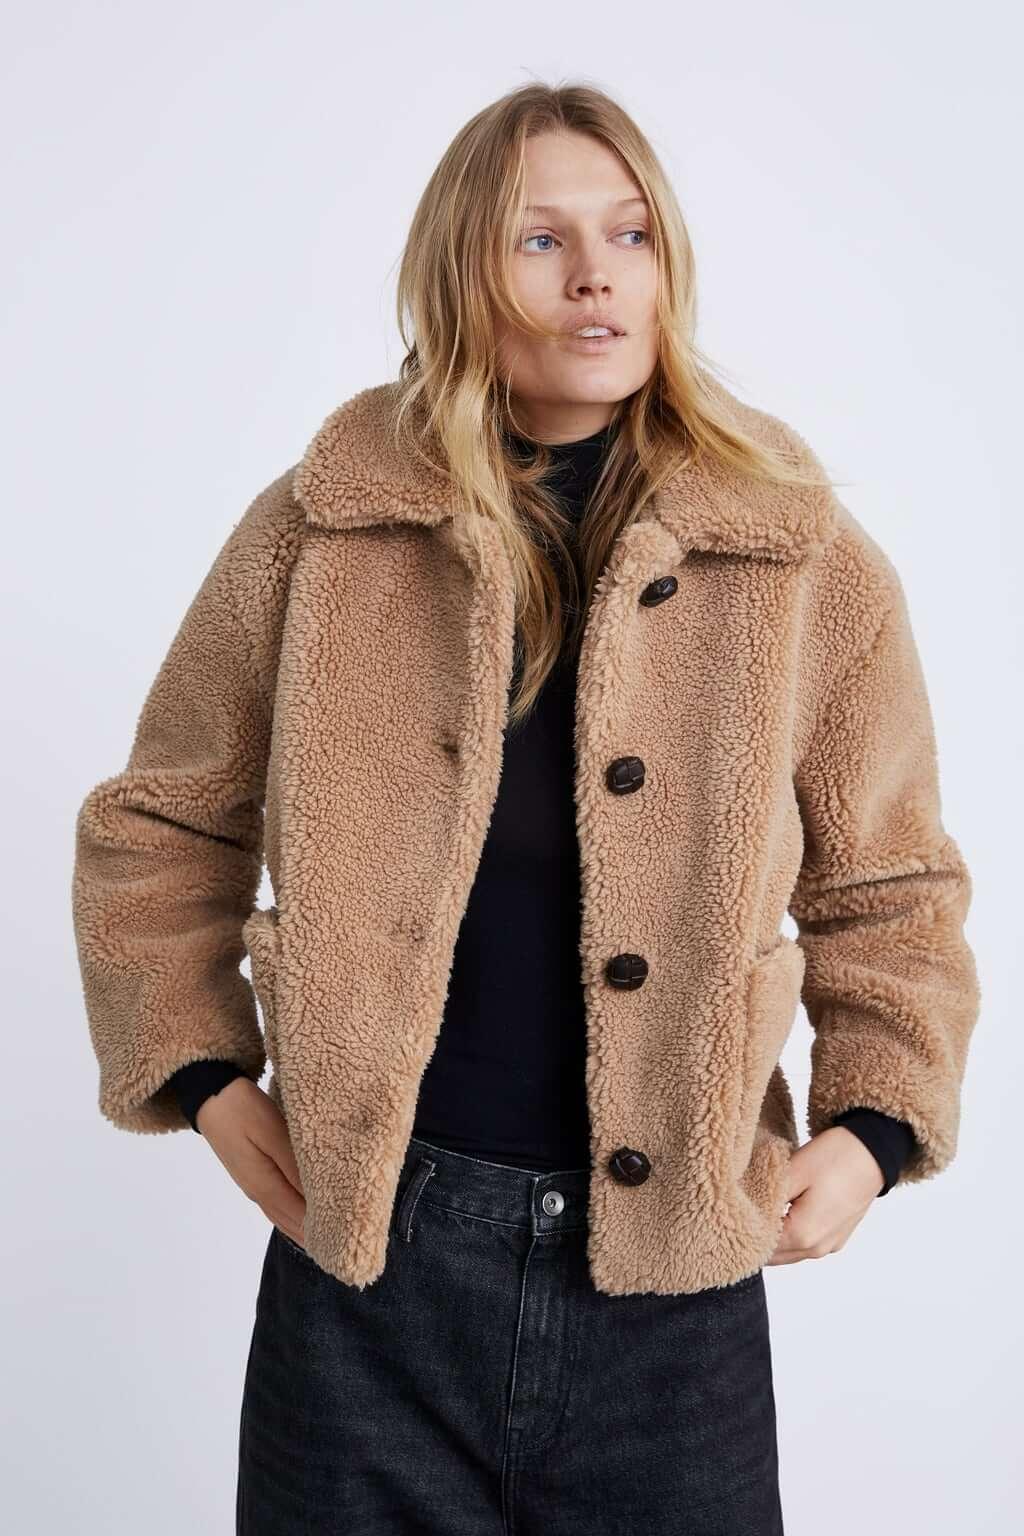 Teddy coat de Zara - abrigo peluche